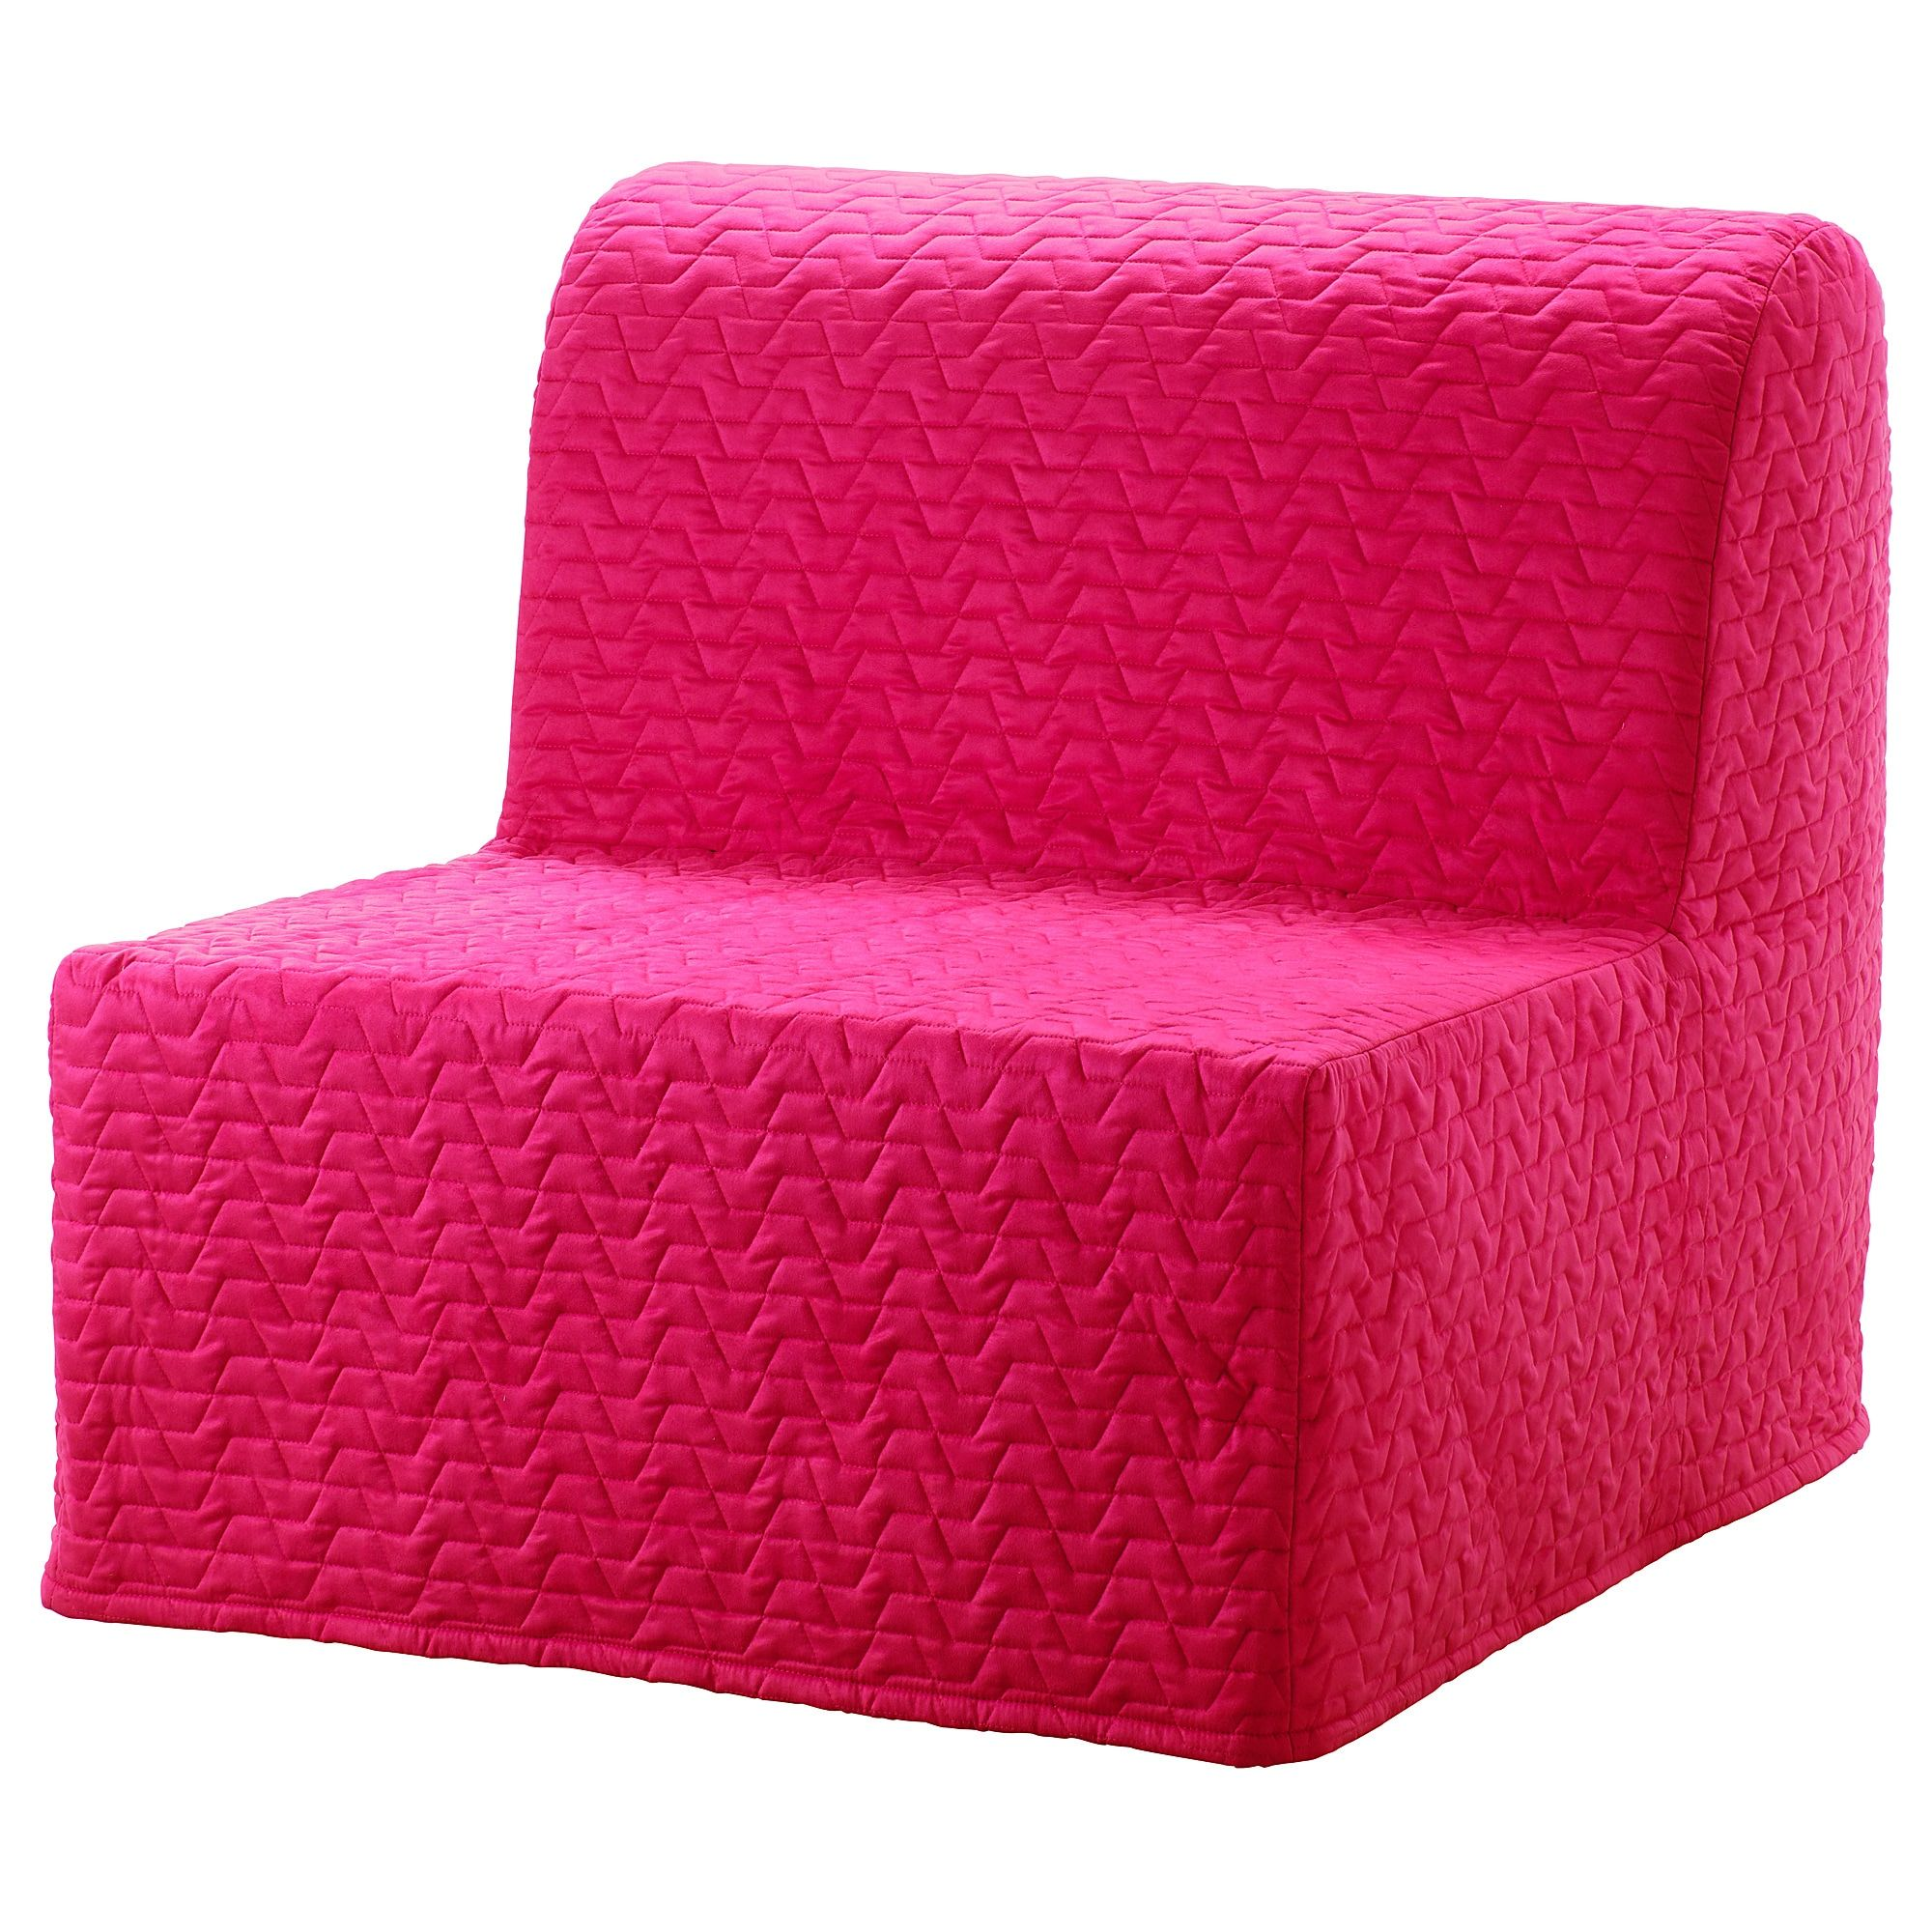 Lycksele Lovas Bettsessel Vallarum Pink Bettsessel Flexible